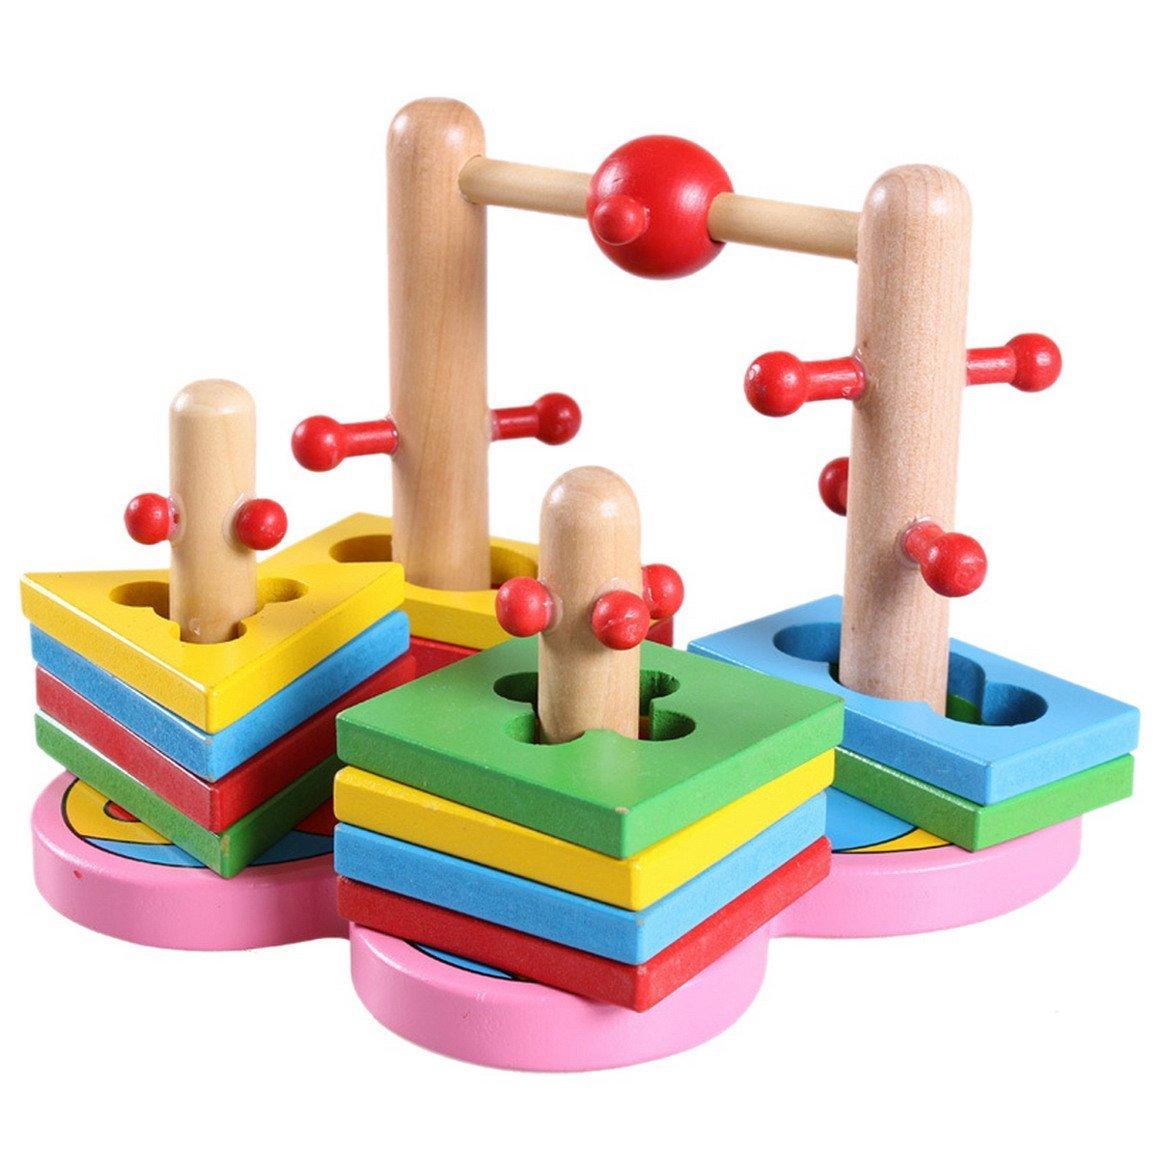 Aivtalk Children Kids Baby Wooden Stacking Shapes Sorting Column Building Blocks Educational Toy